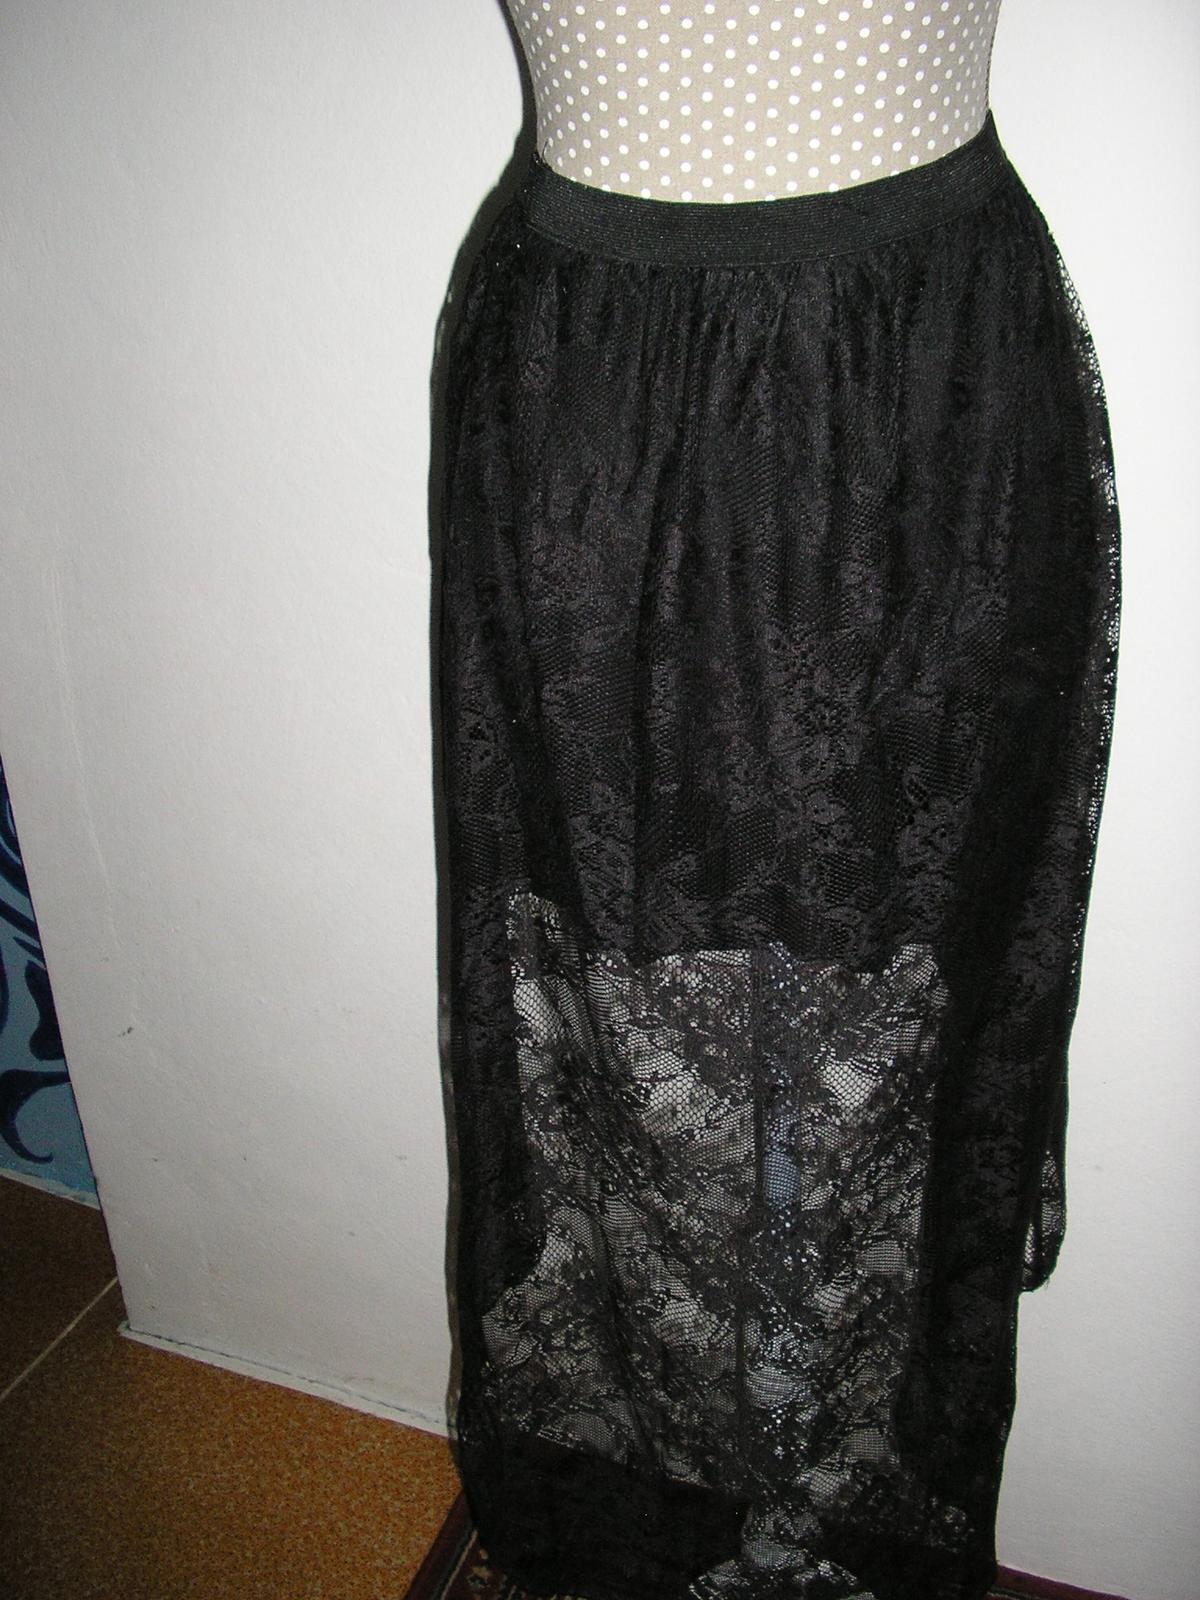 1072. Ginatrikot Čierna čipková sukňa  - Obrázok č. 2